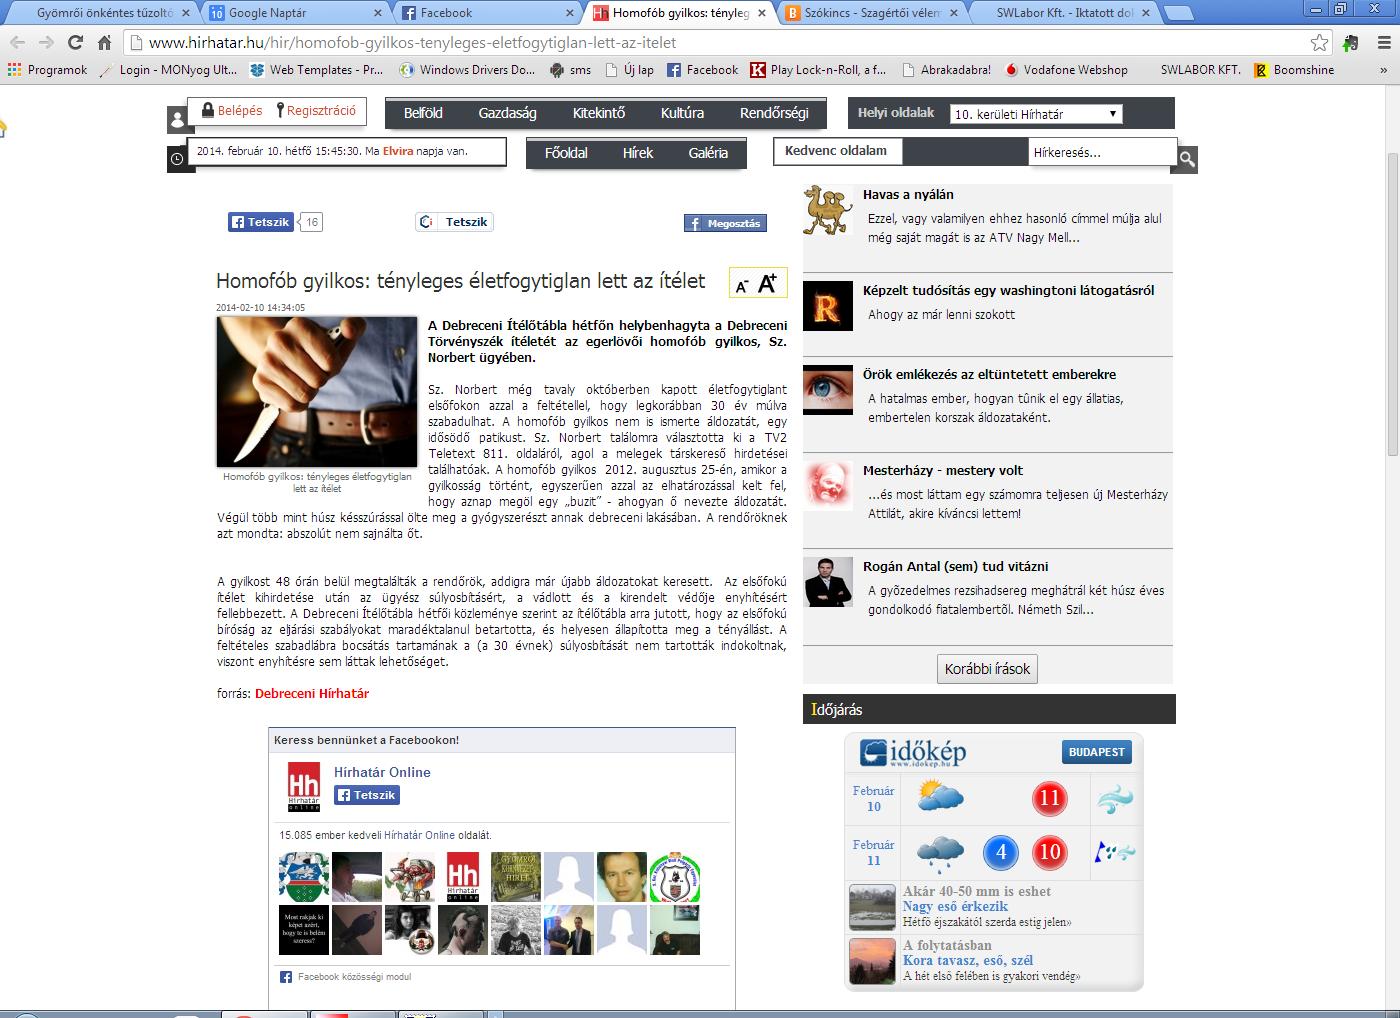 Screenshot 2014-02-10 15.45.30.png